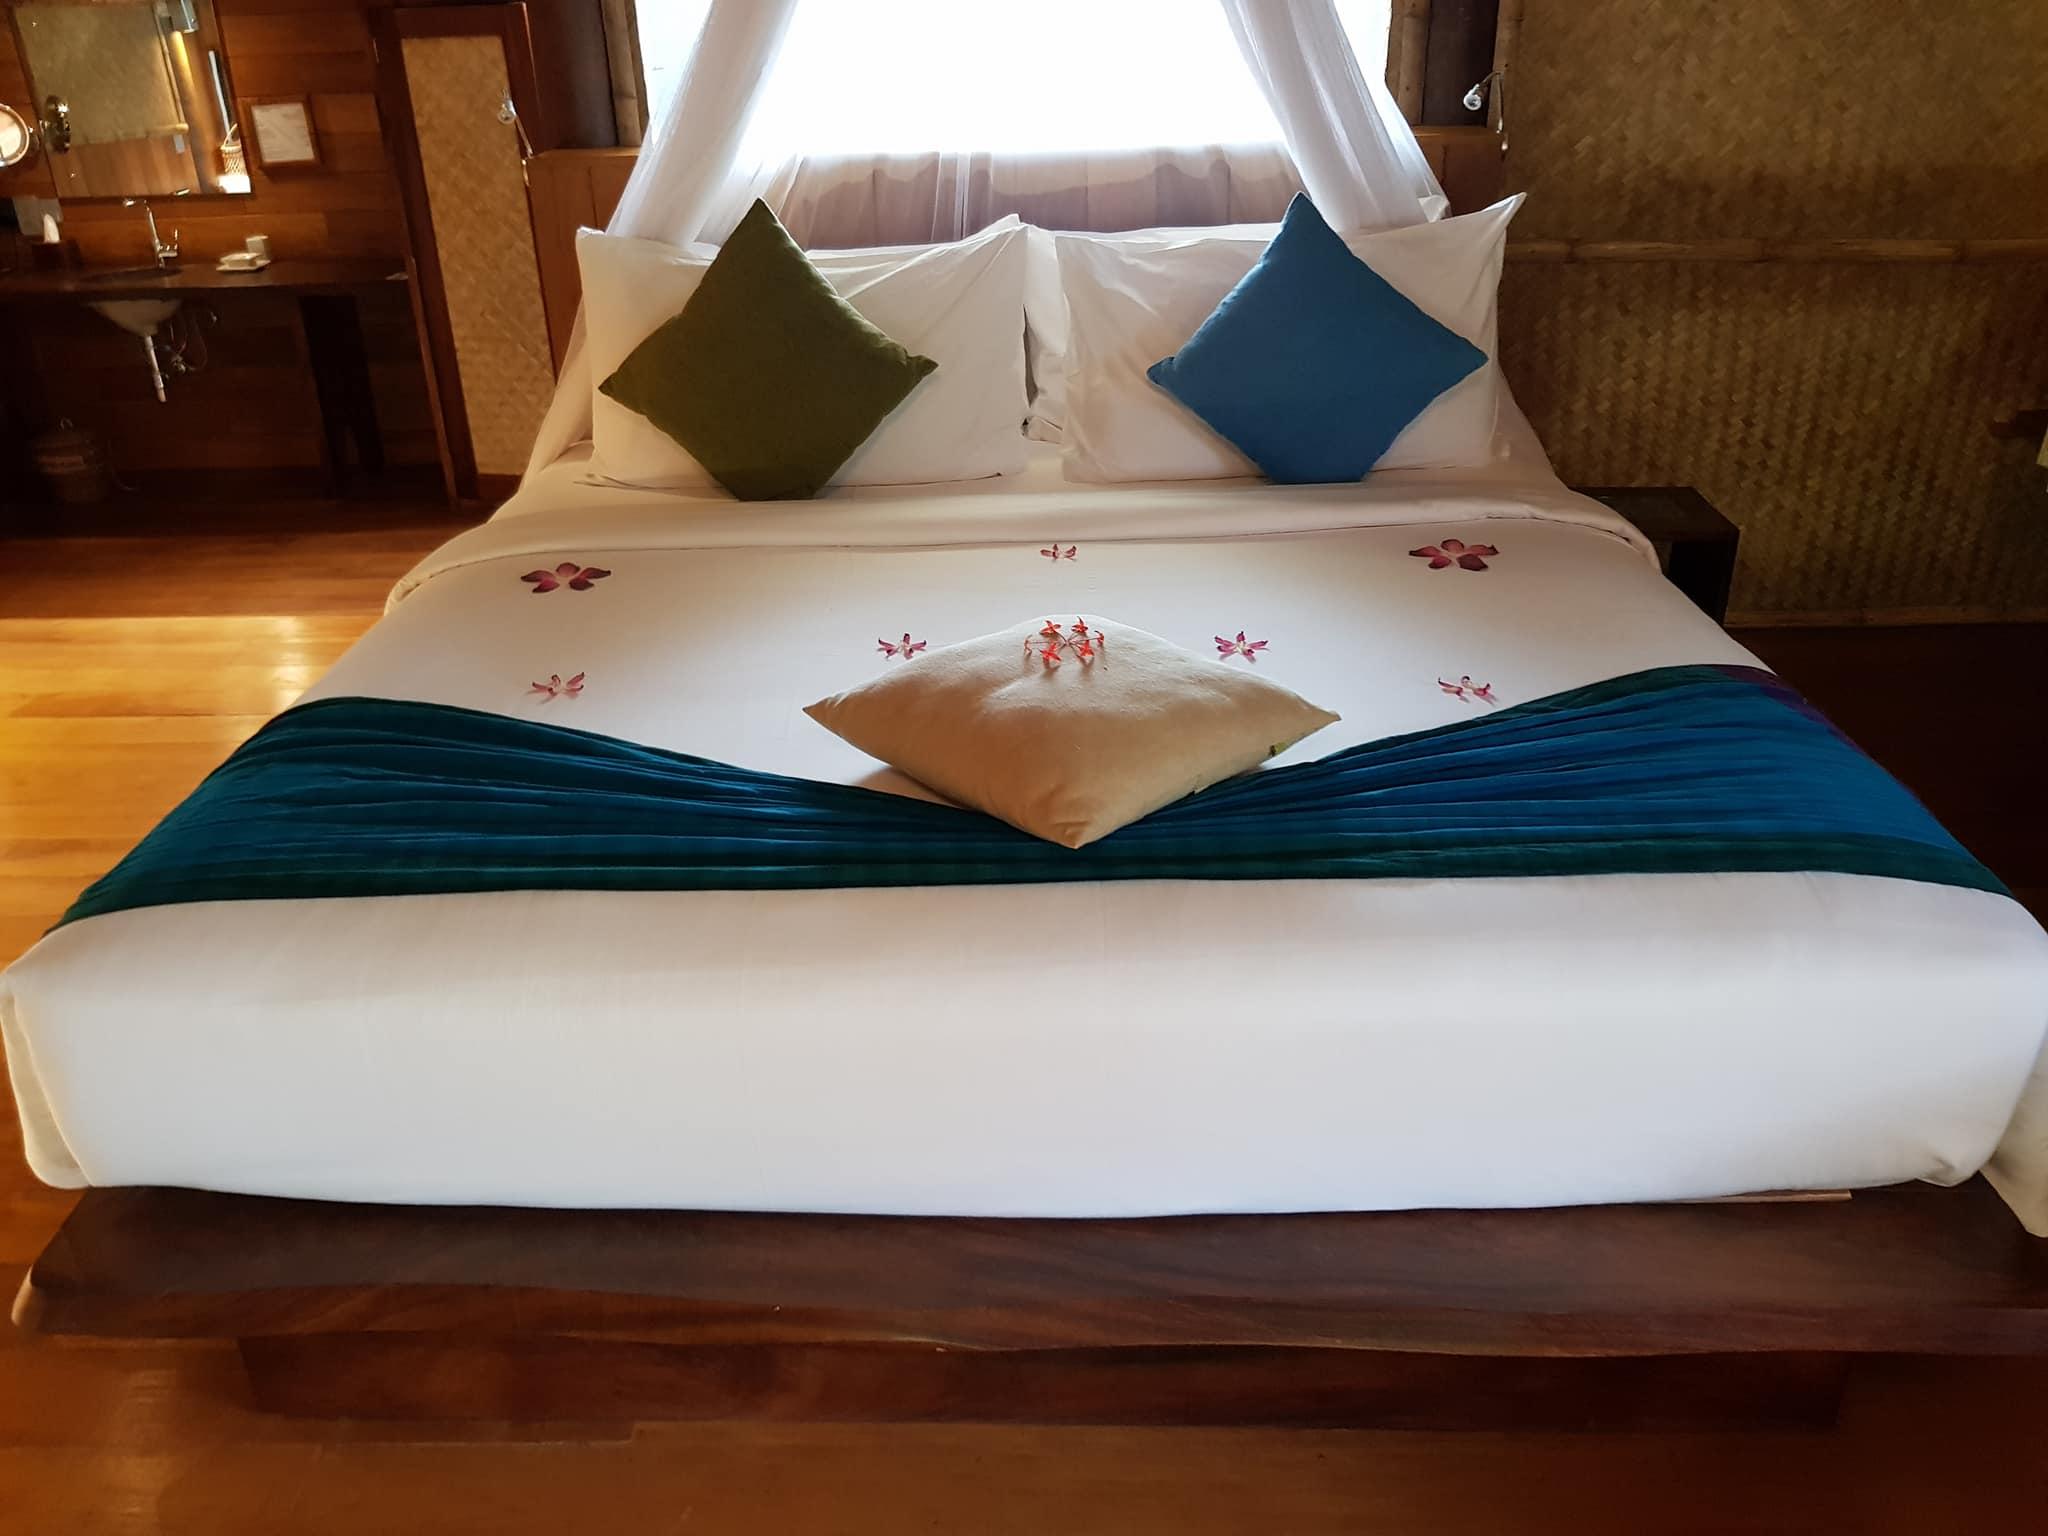 invite-to-paradise-sri-lanka-maldives-holiday-honeymoon-specialists-customer-guest-feedback-zane-lisa-butcher-jetwing-vil-uyana-hotel-sigiriya-cultural-triangle-room-bed-decoration.jpg